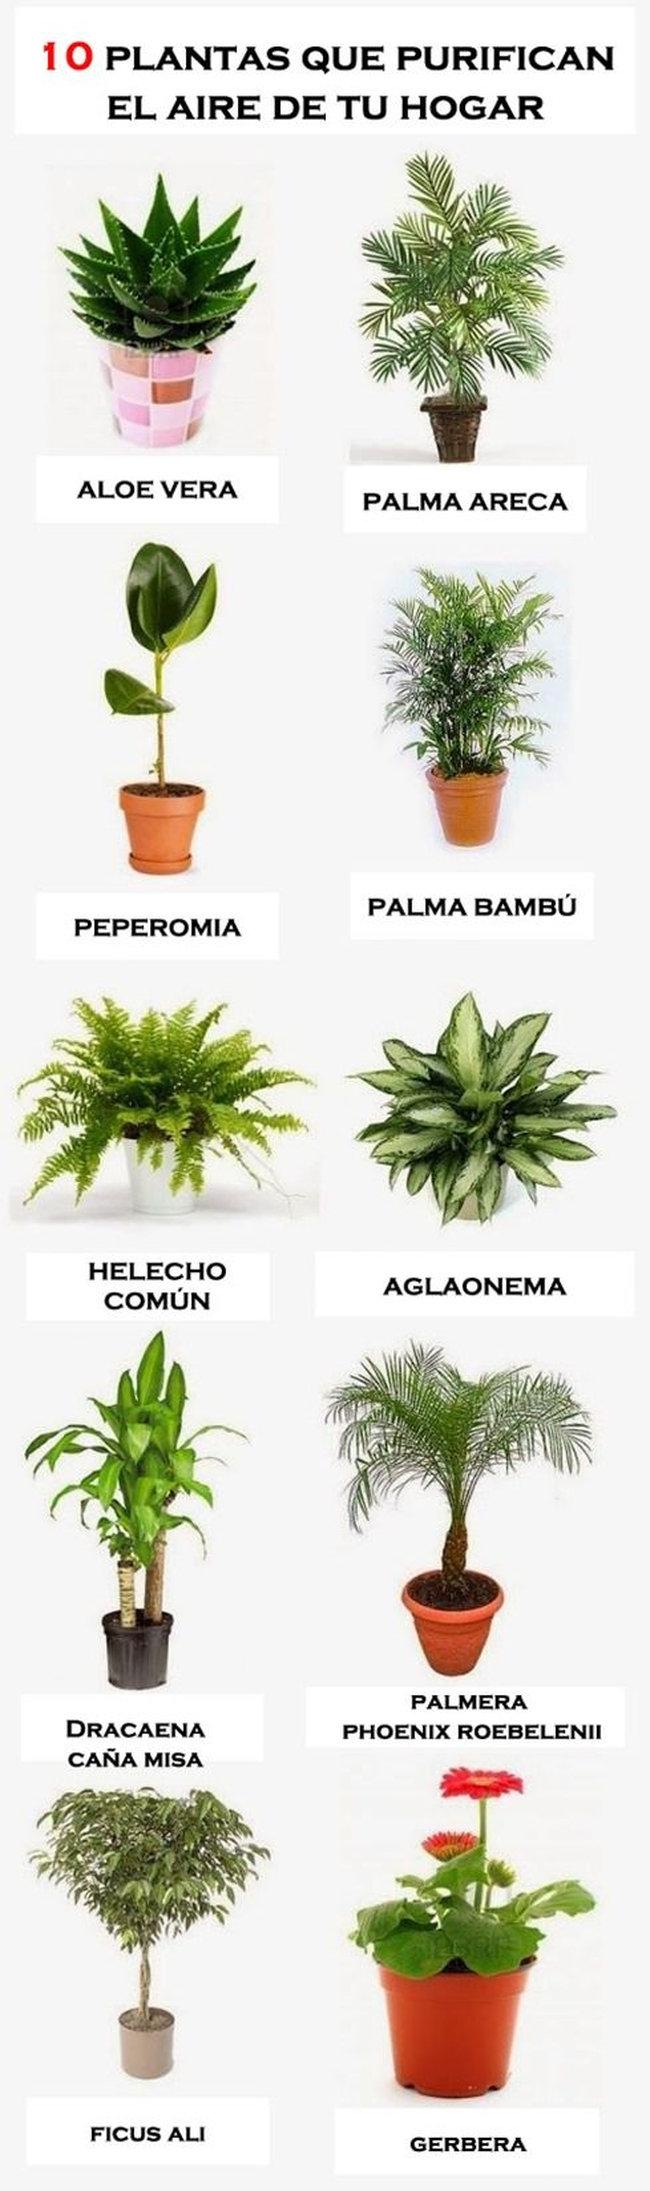 10 plantas que purifican el aire de tu hogar infograf a Plantas limpiadoras de aire